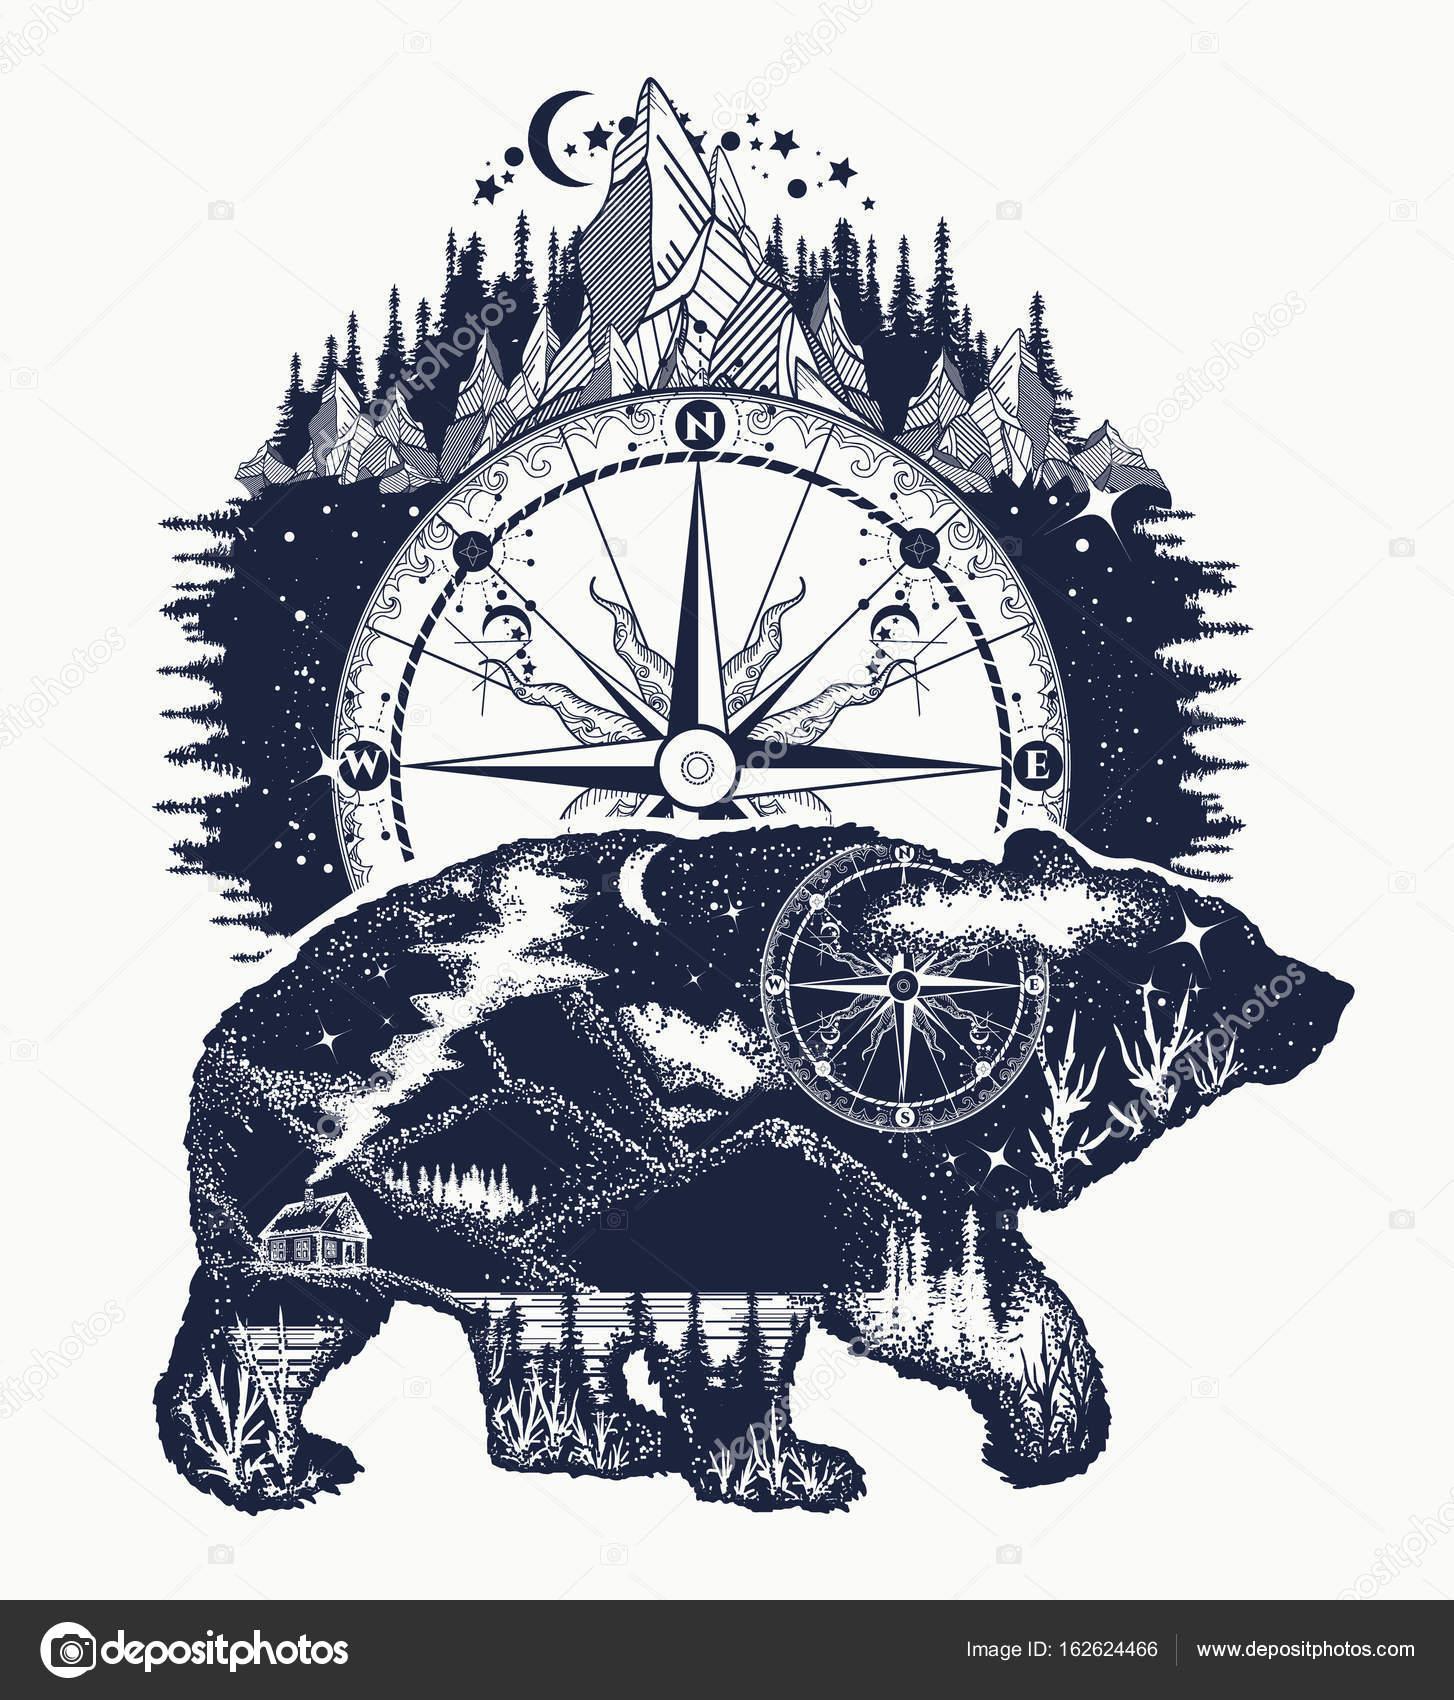 Tatuajes Osos Tribales Oso Y Montañas Del Tatuaje Arte Símbolo De